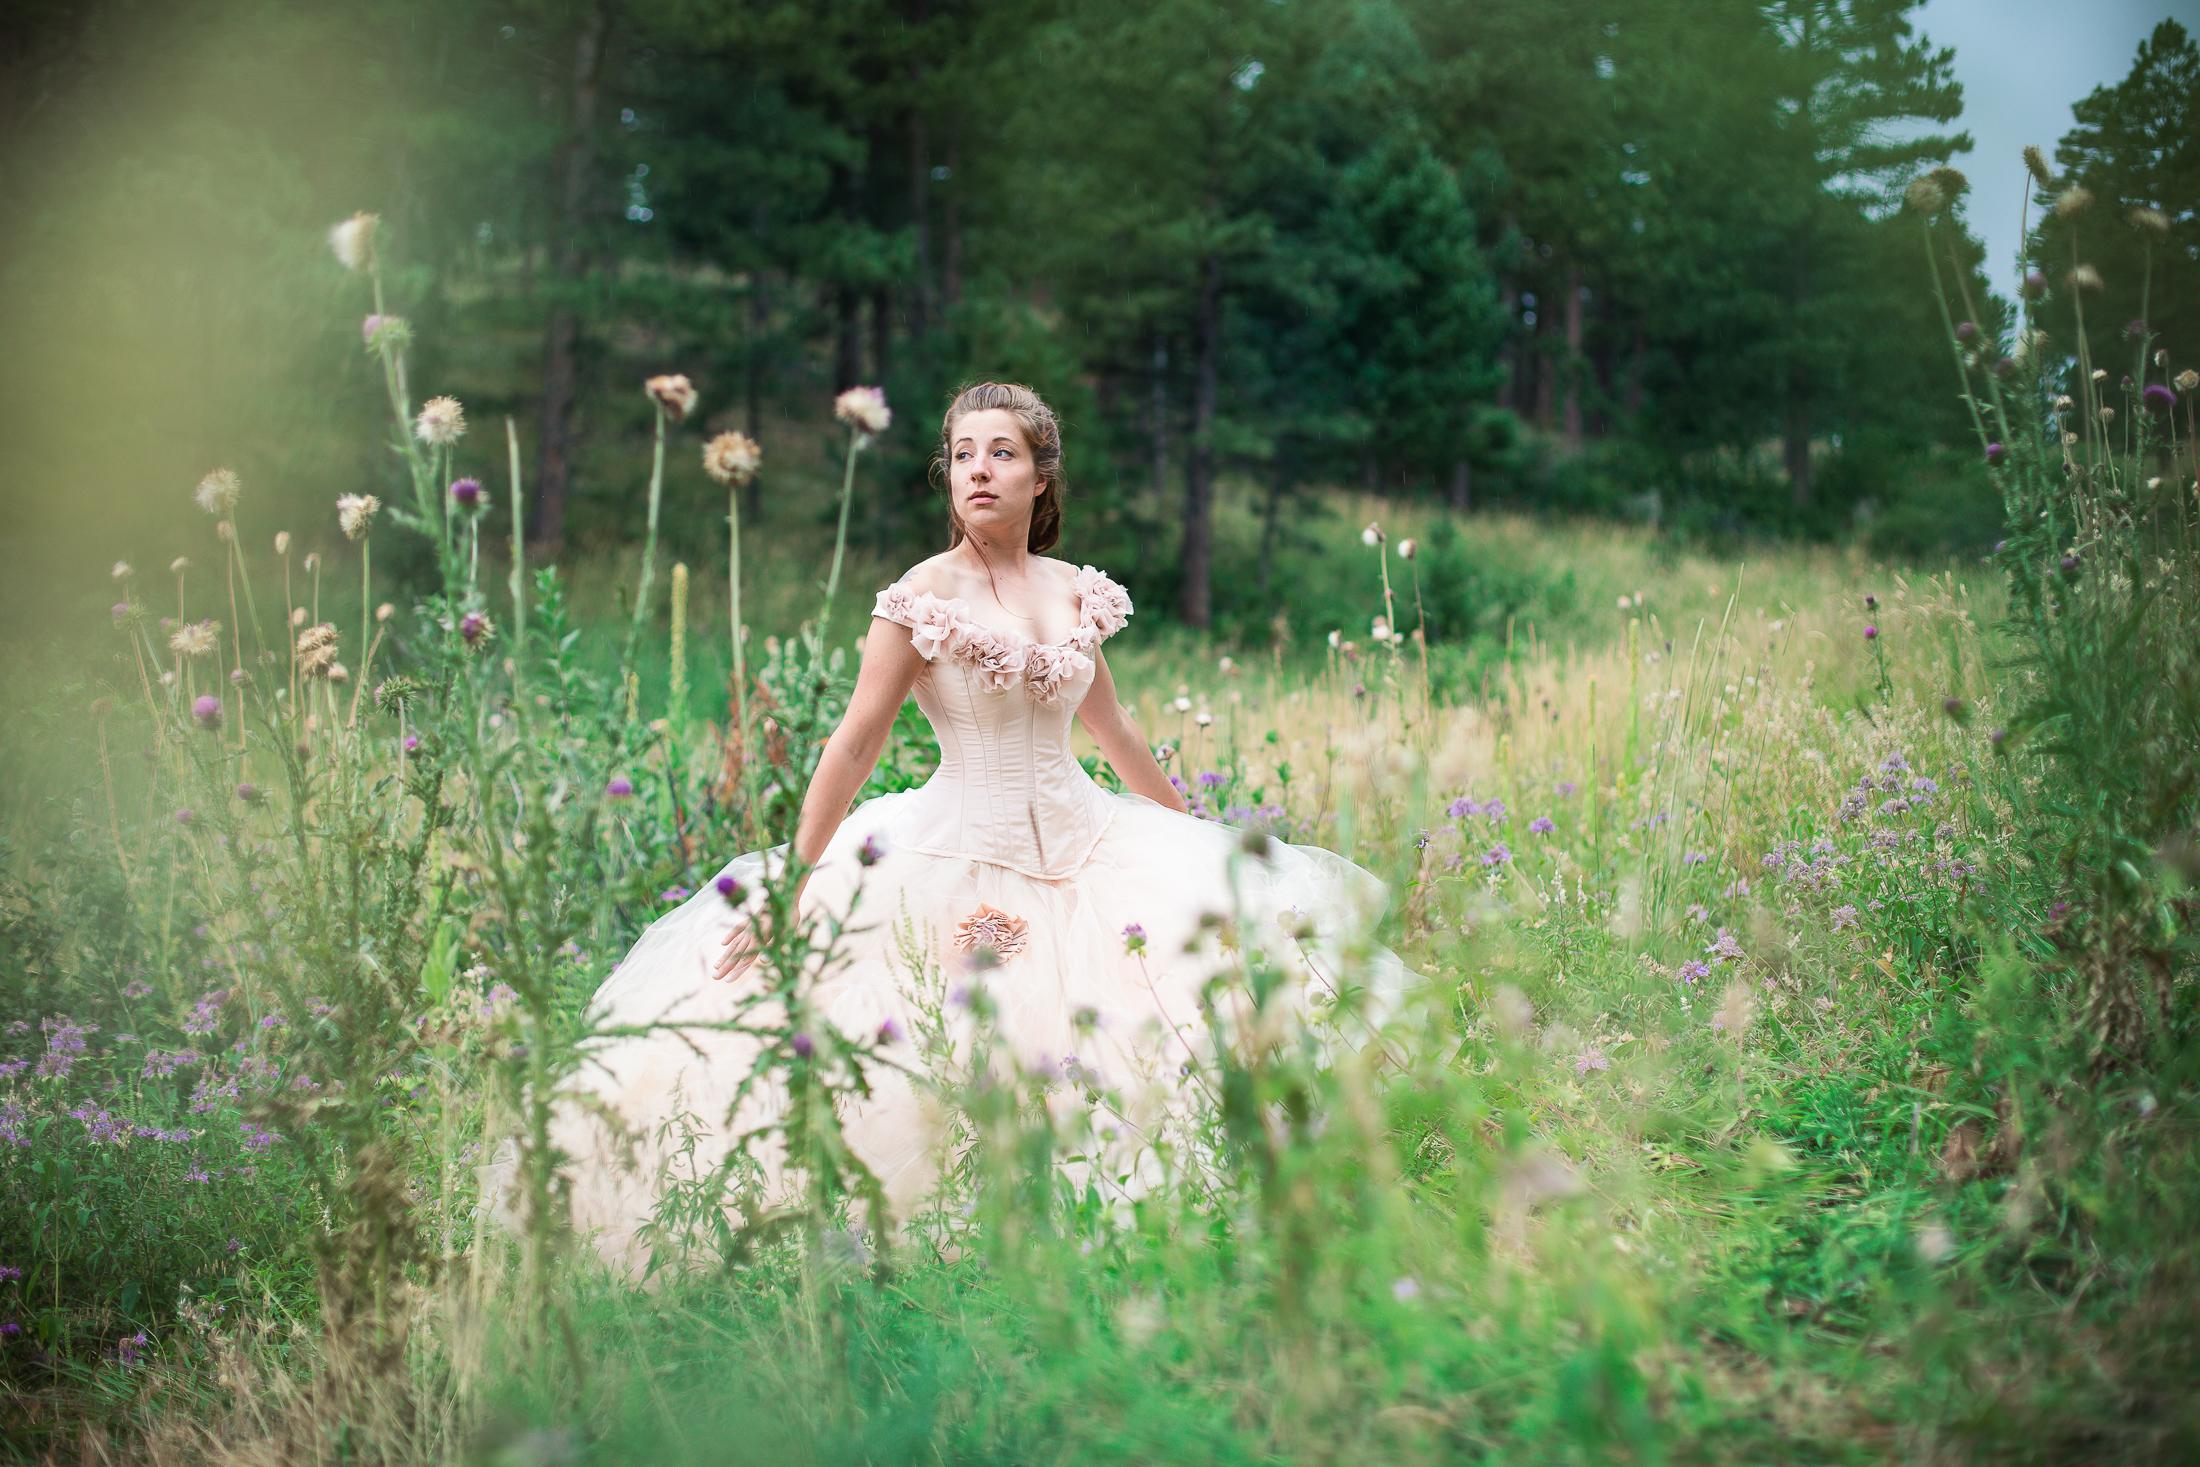 Jen_Montgomery_Photography_MN_sarahdressCO-6.jpg